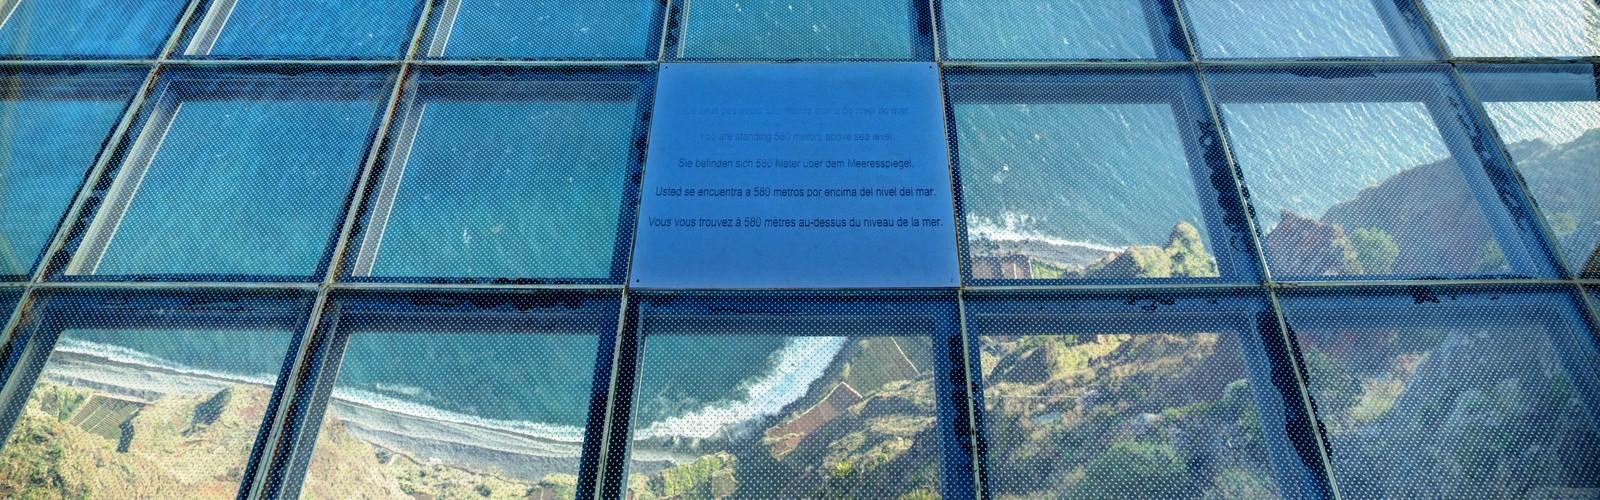 Cabo Girao viewpoint in Madeira Island